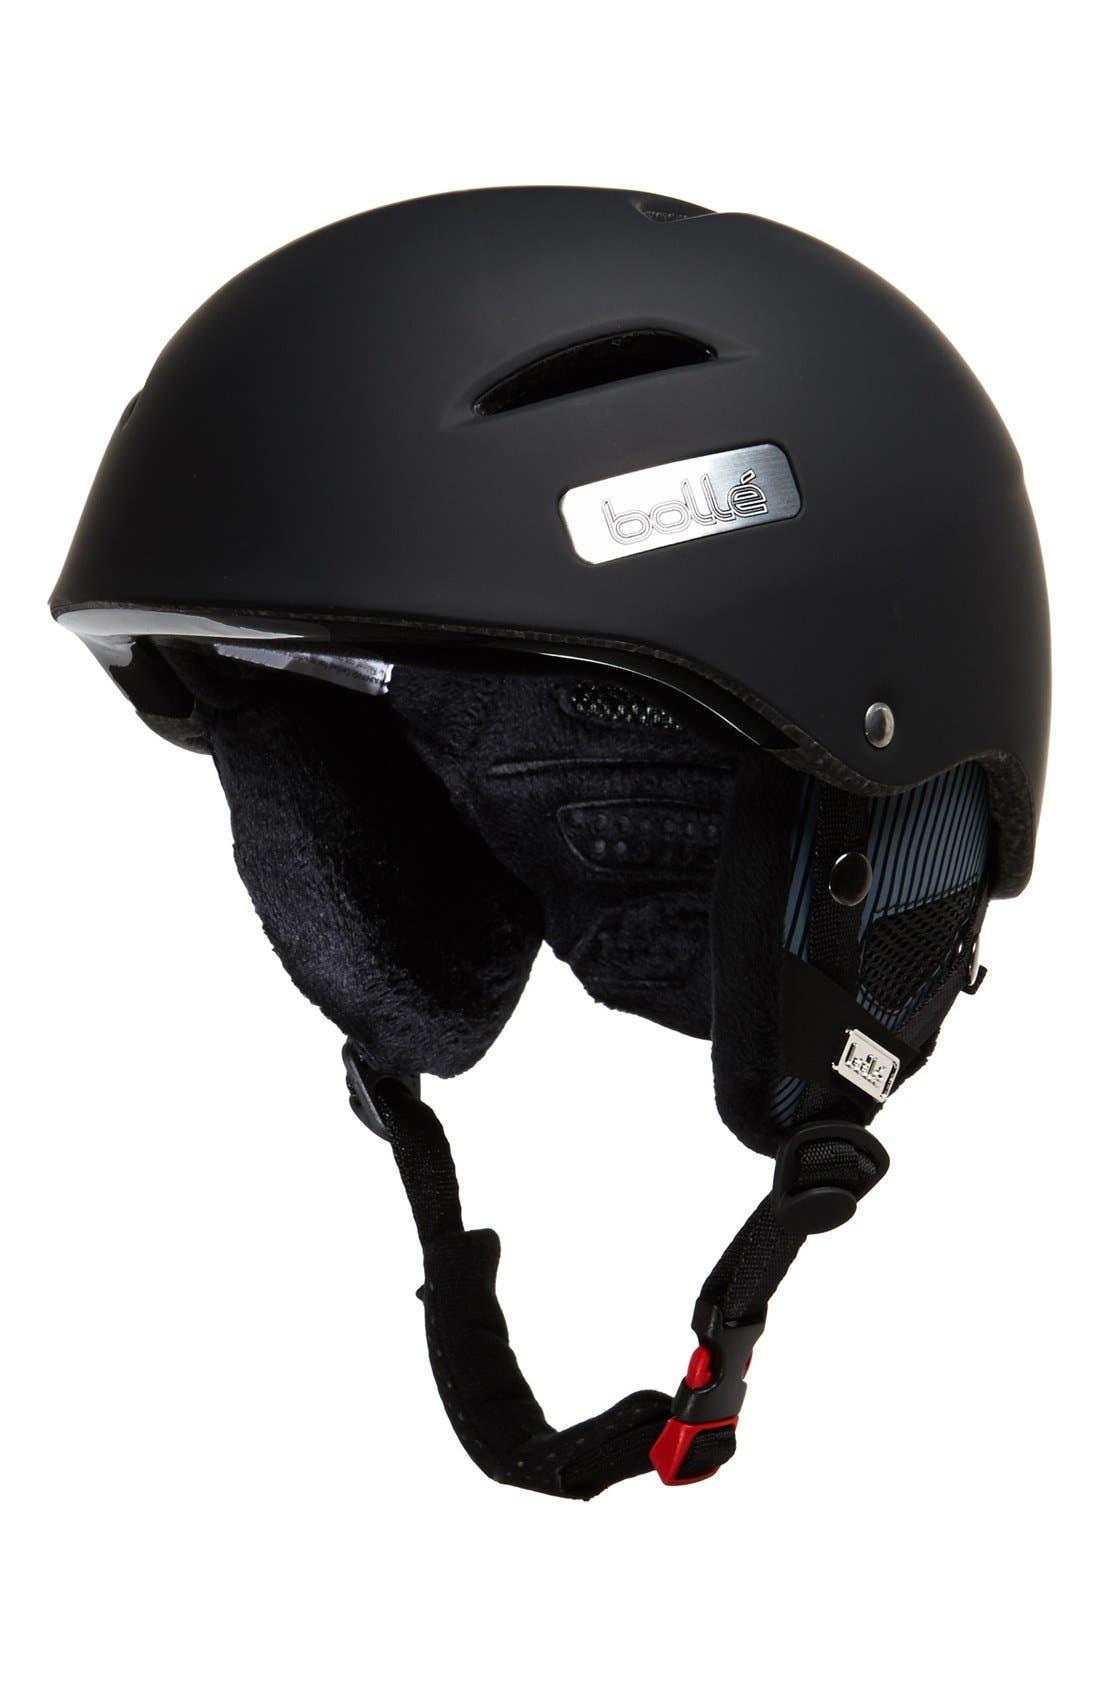 Alternate Image 1 Selected - Bolle 'B-Star' Snowboard Helmet